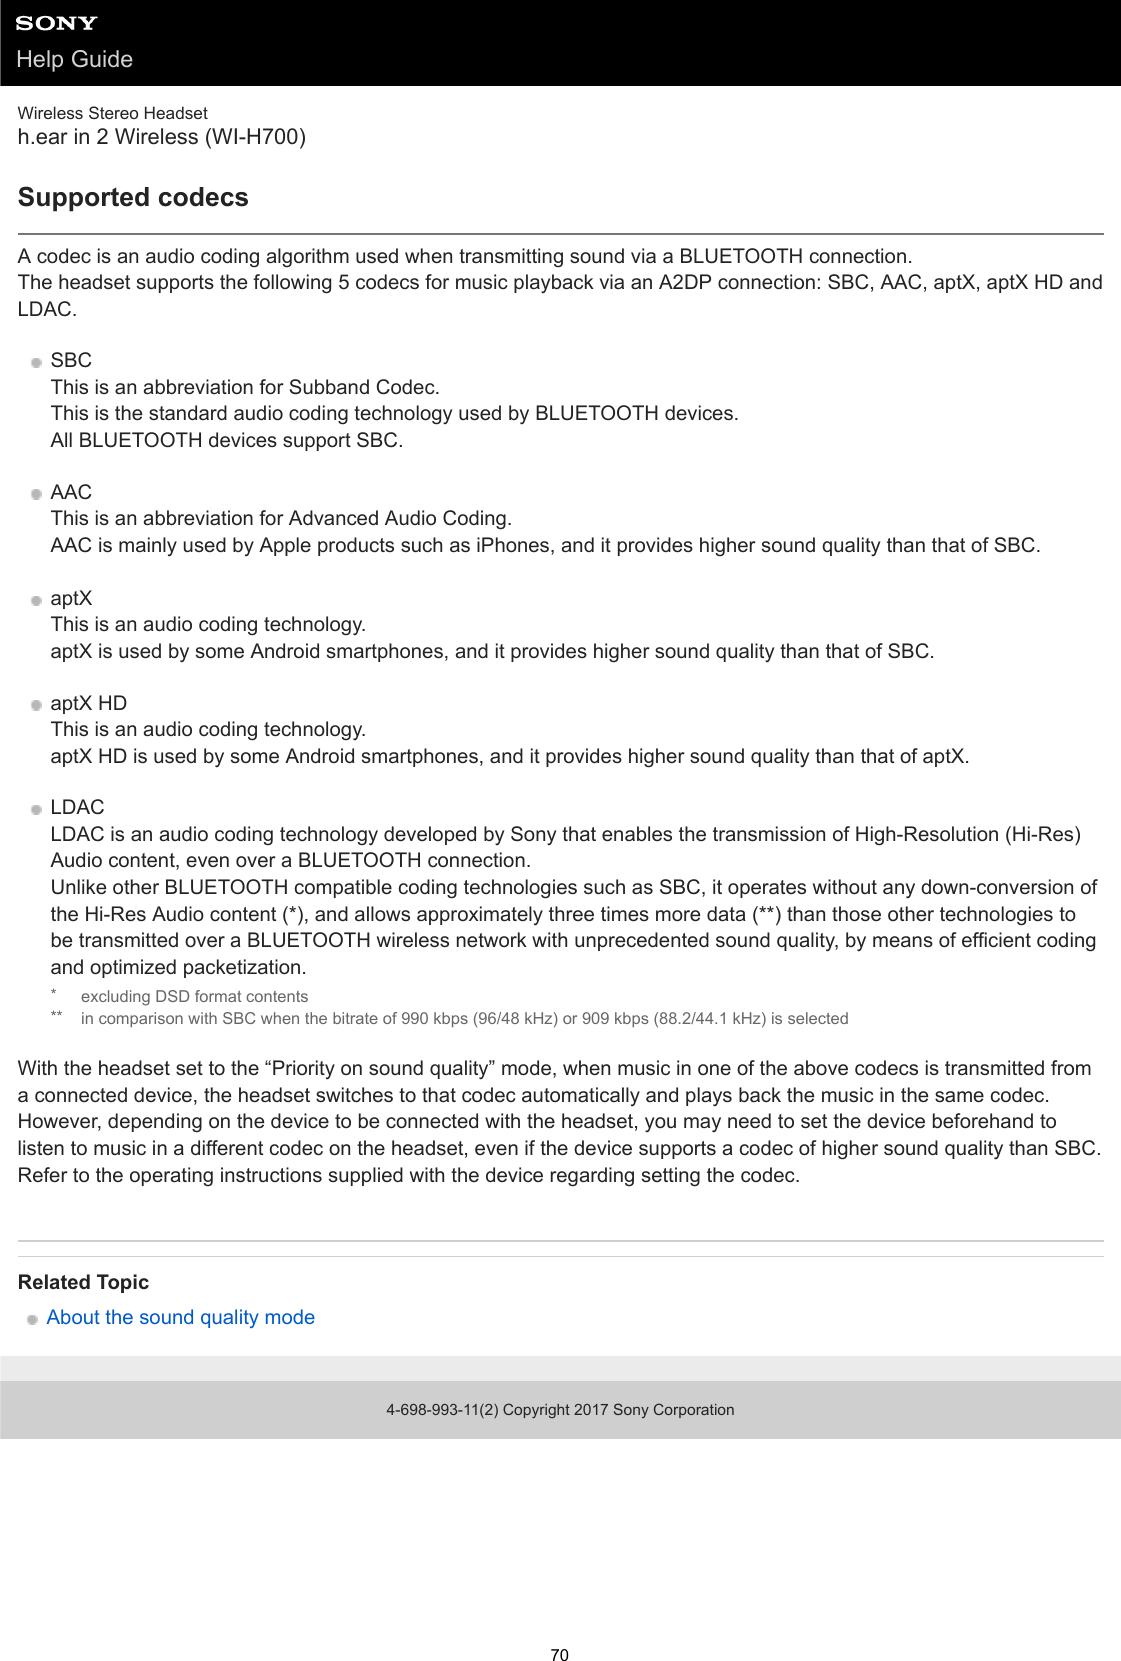 Sony WI H700 User Manual Help Guide (Printable PDF) 4698993112